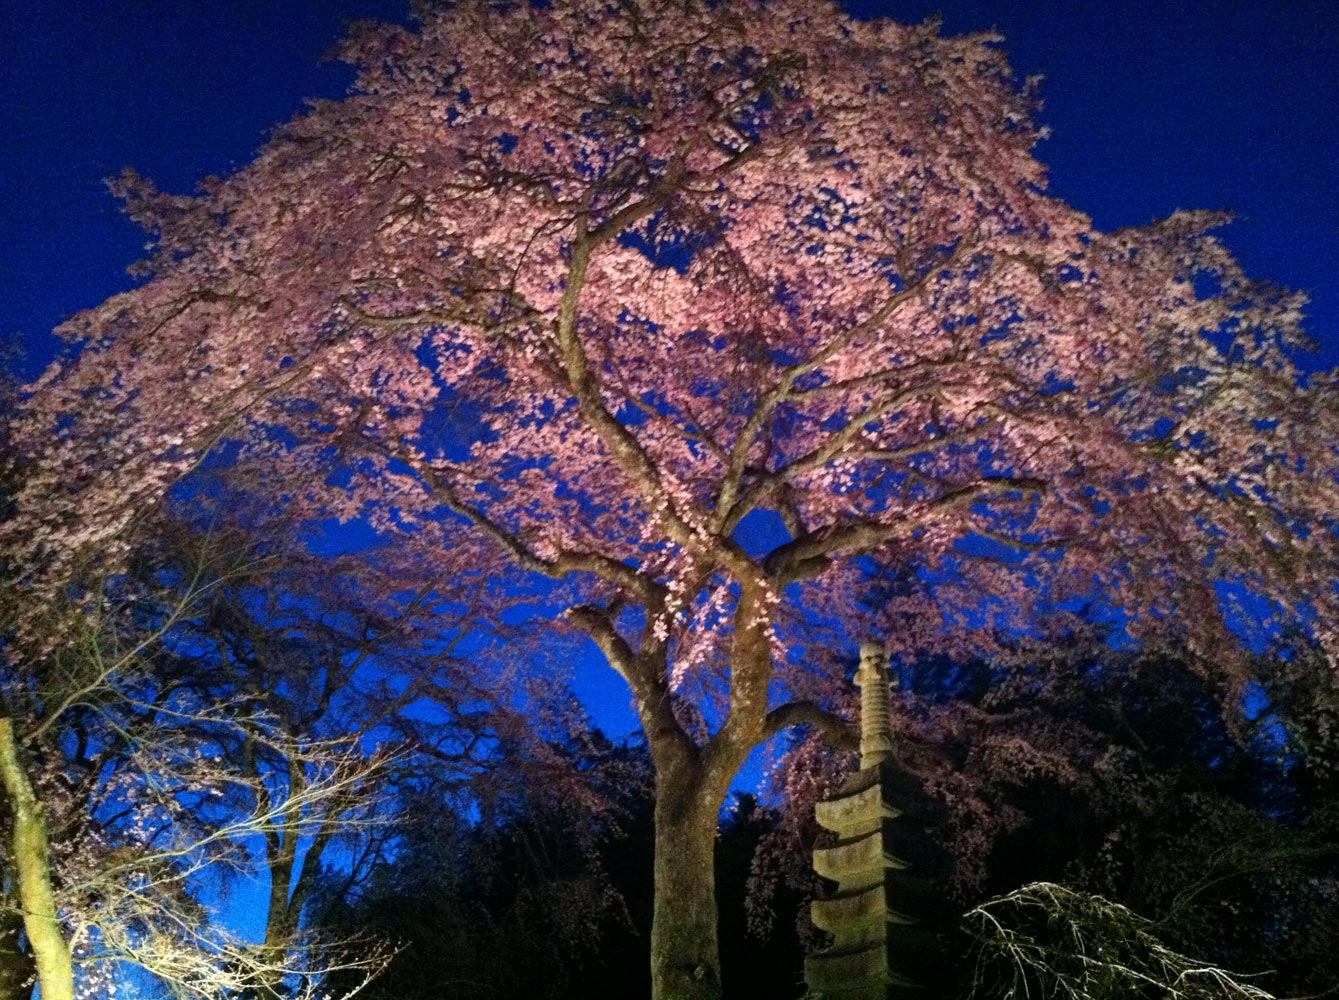 Tsunami and the Cherry Blossom film